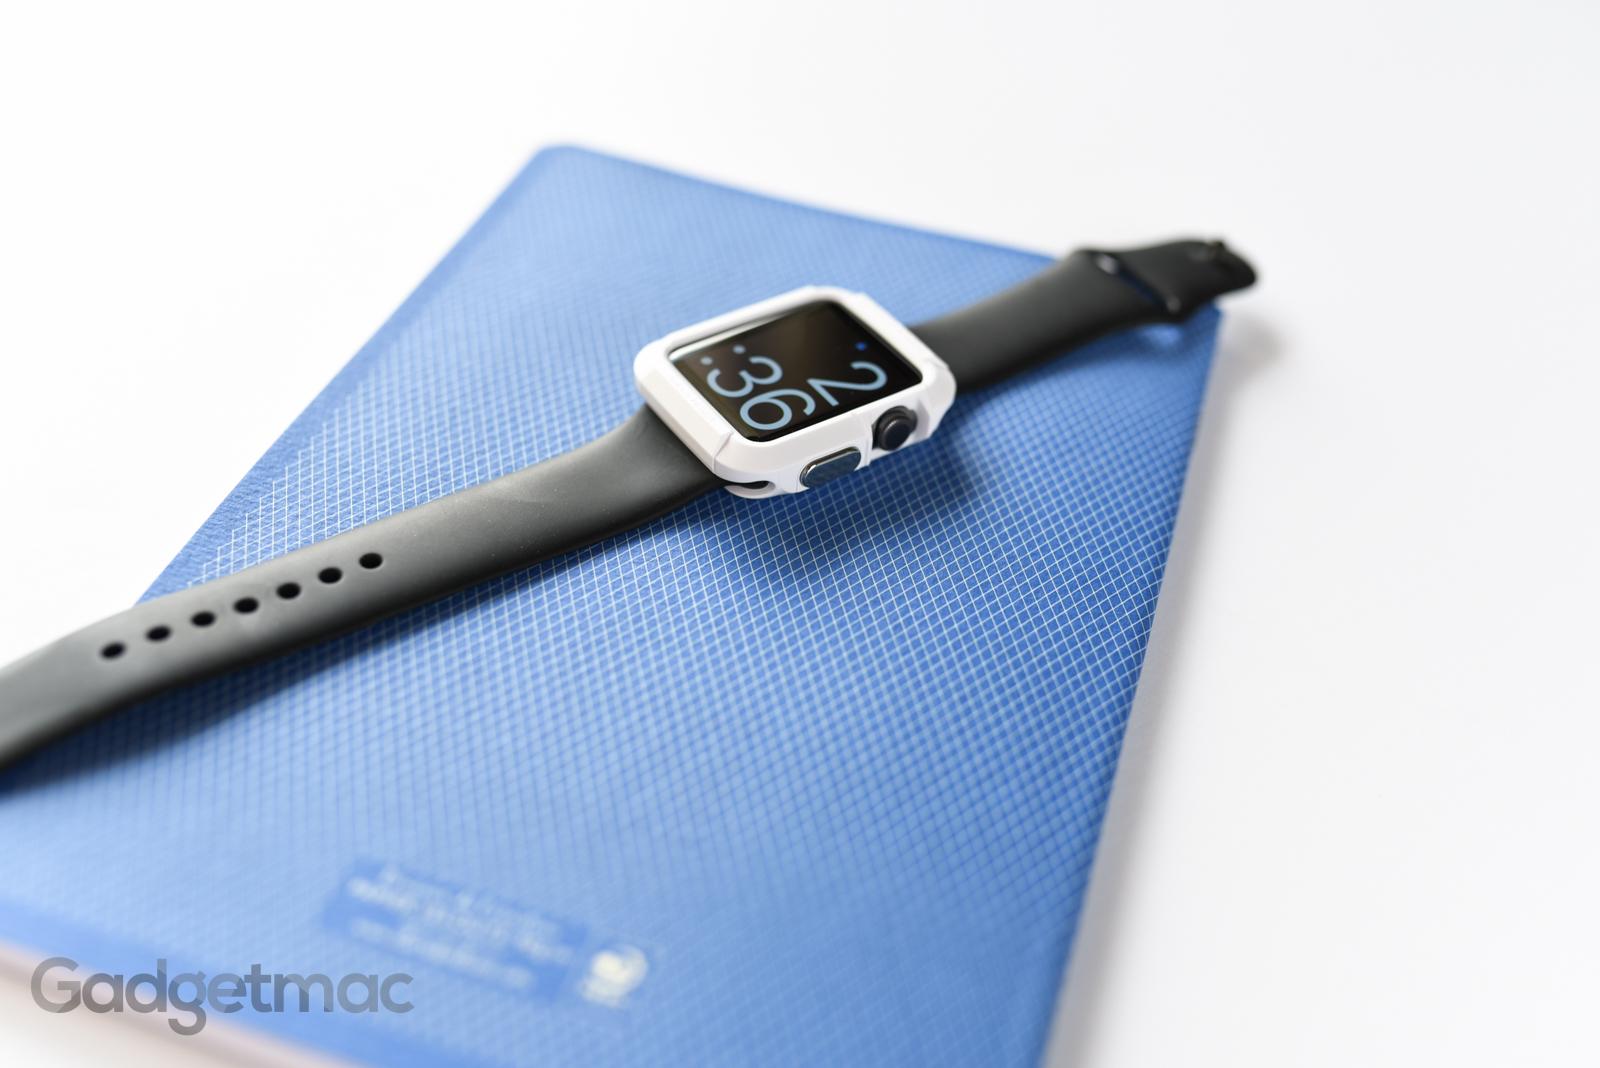 spigen-rugged-armor-case-for-apple-watch-space-gray-white.jpg